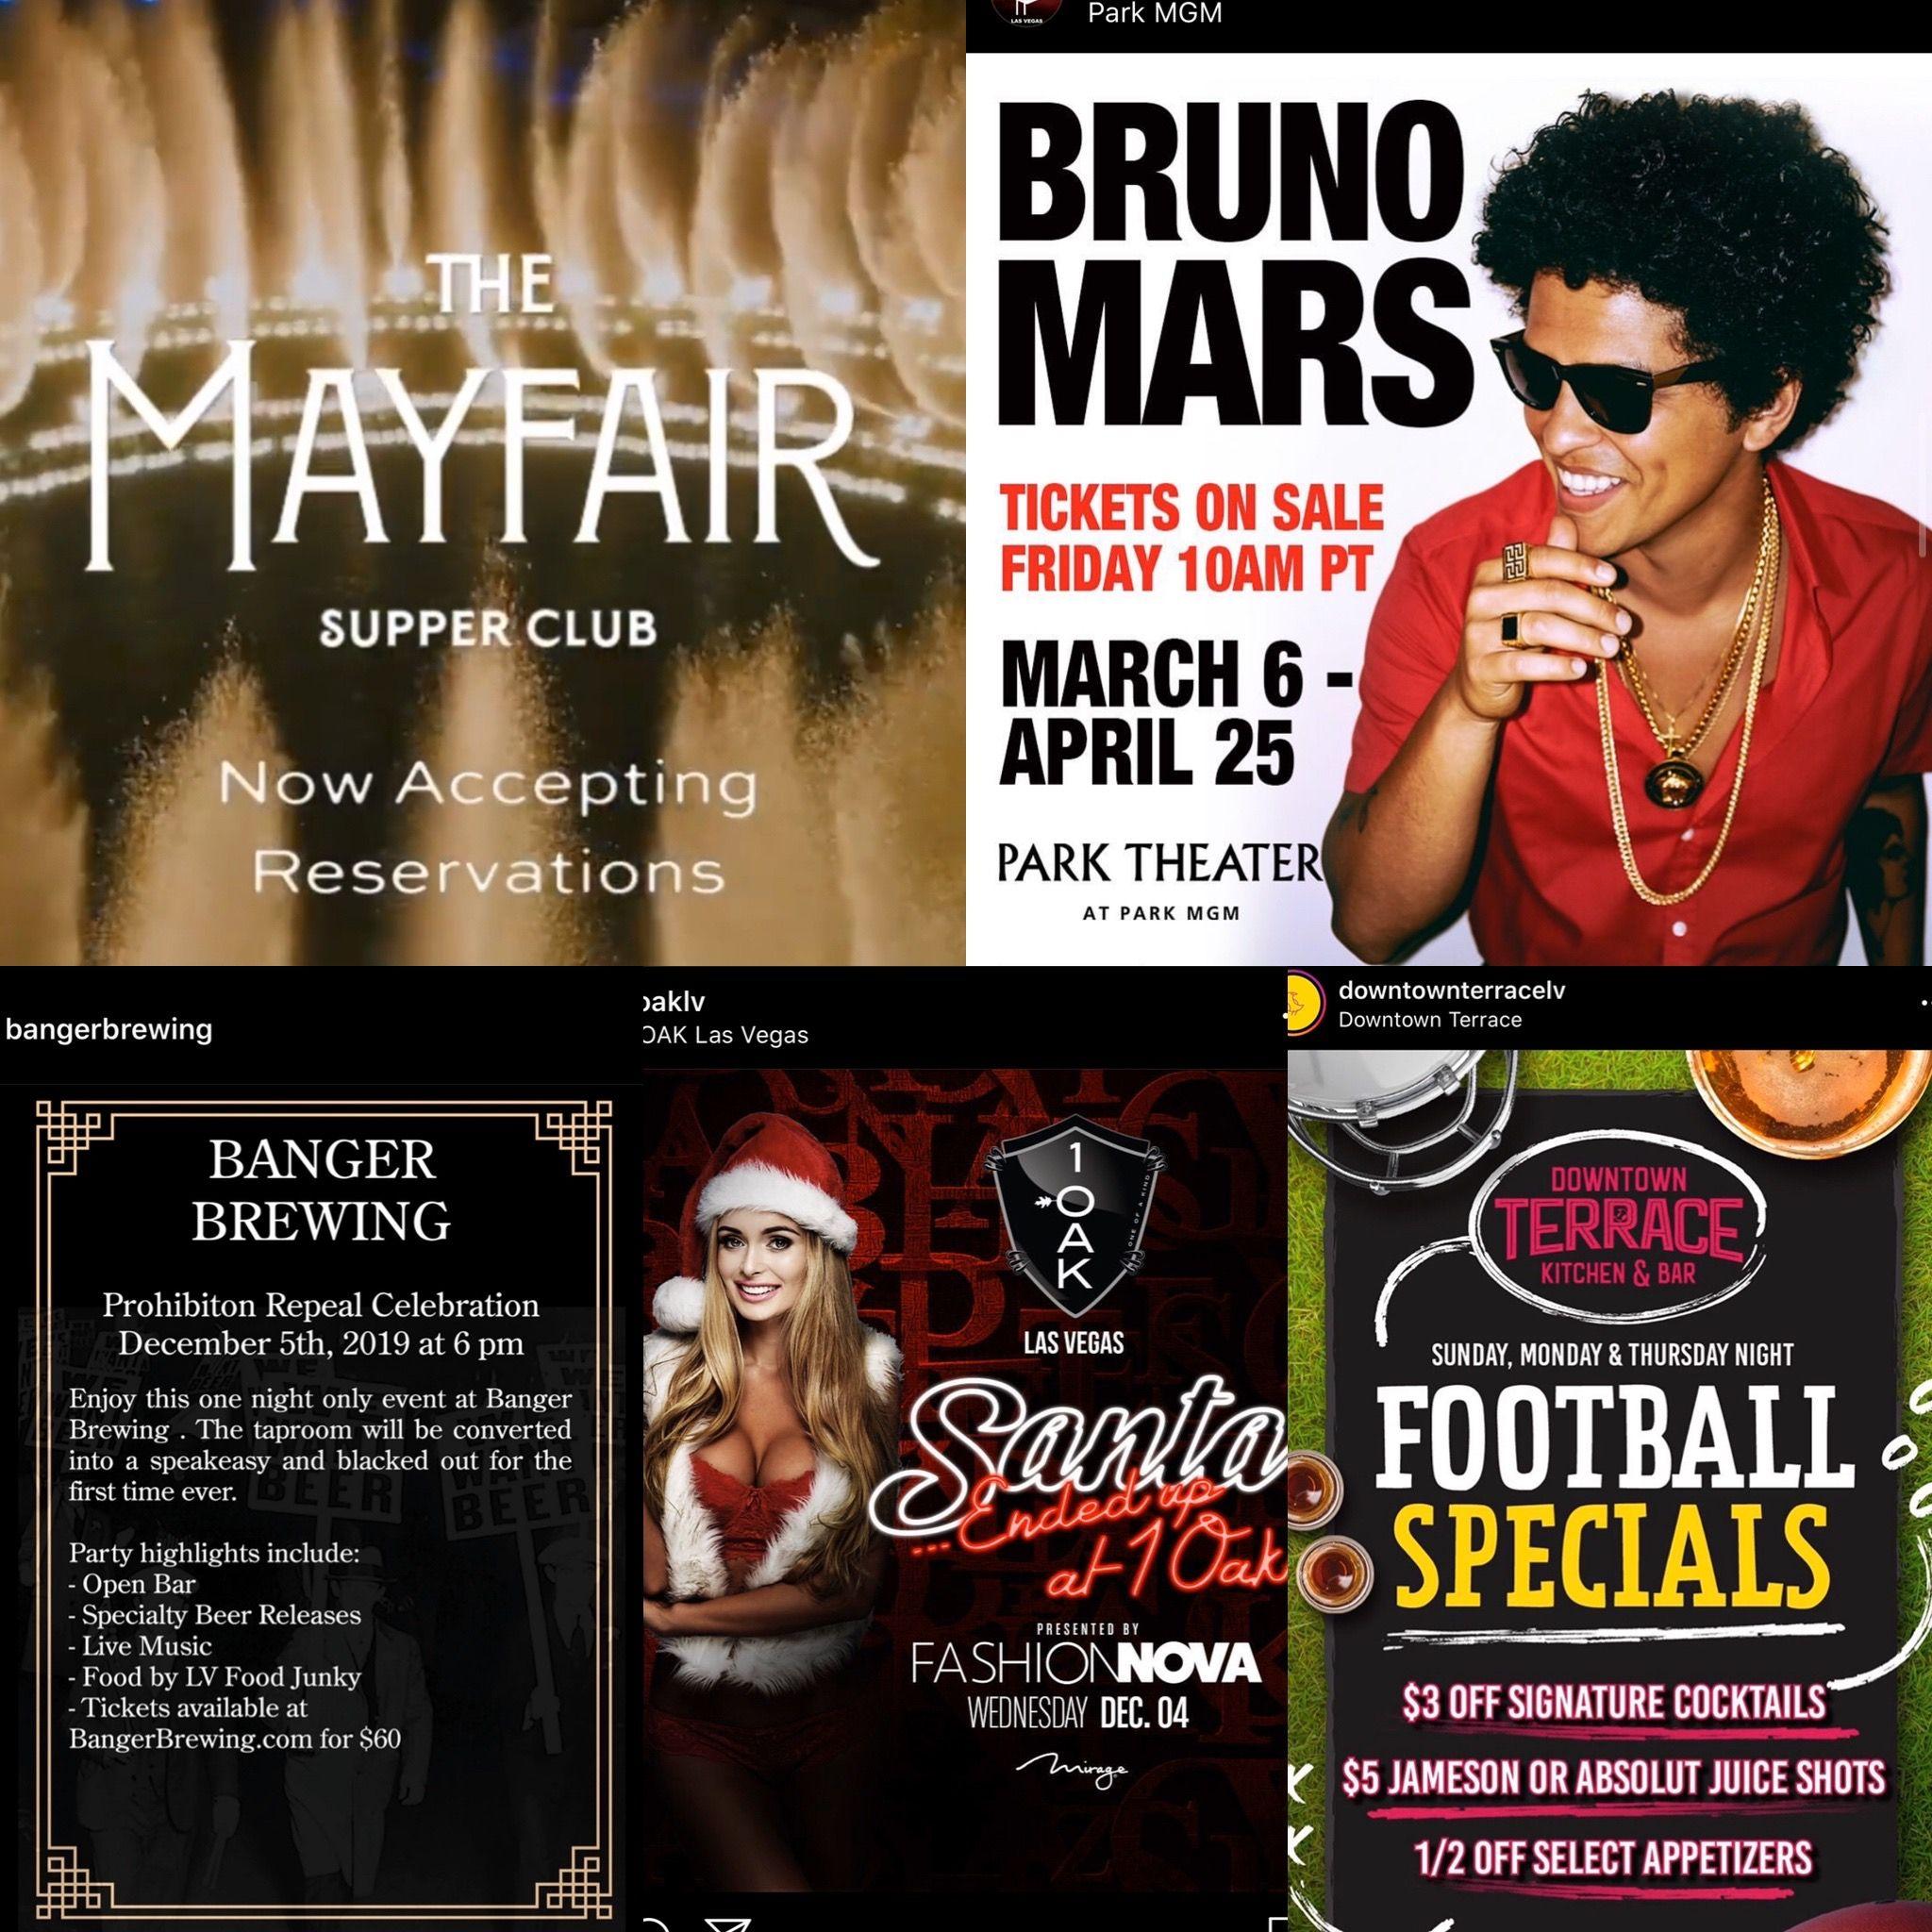 Event Highlights Las Vegas Las Vegas Nightlife Las Vegas Party Las Vegas Events